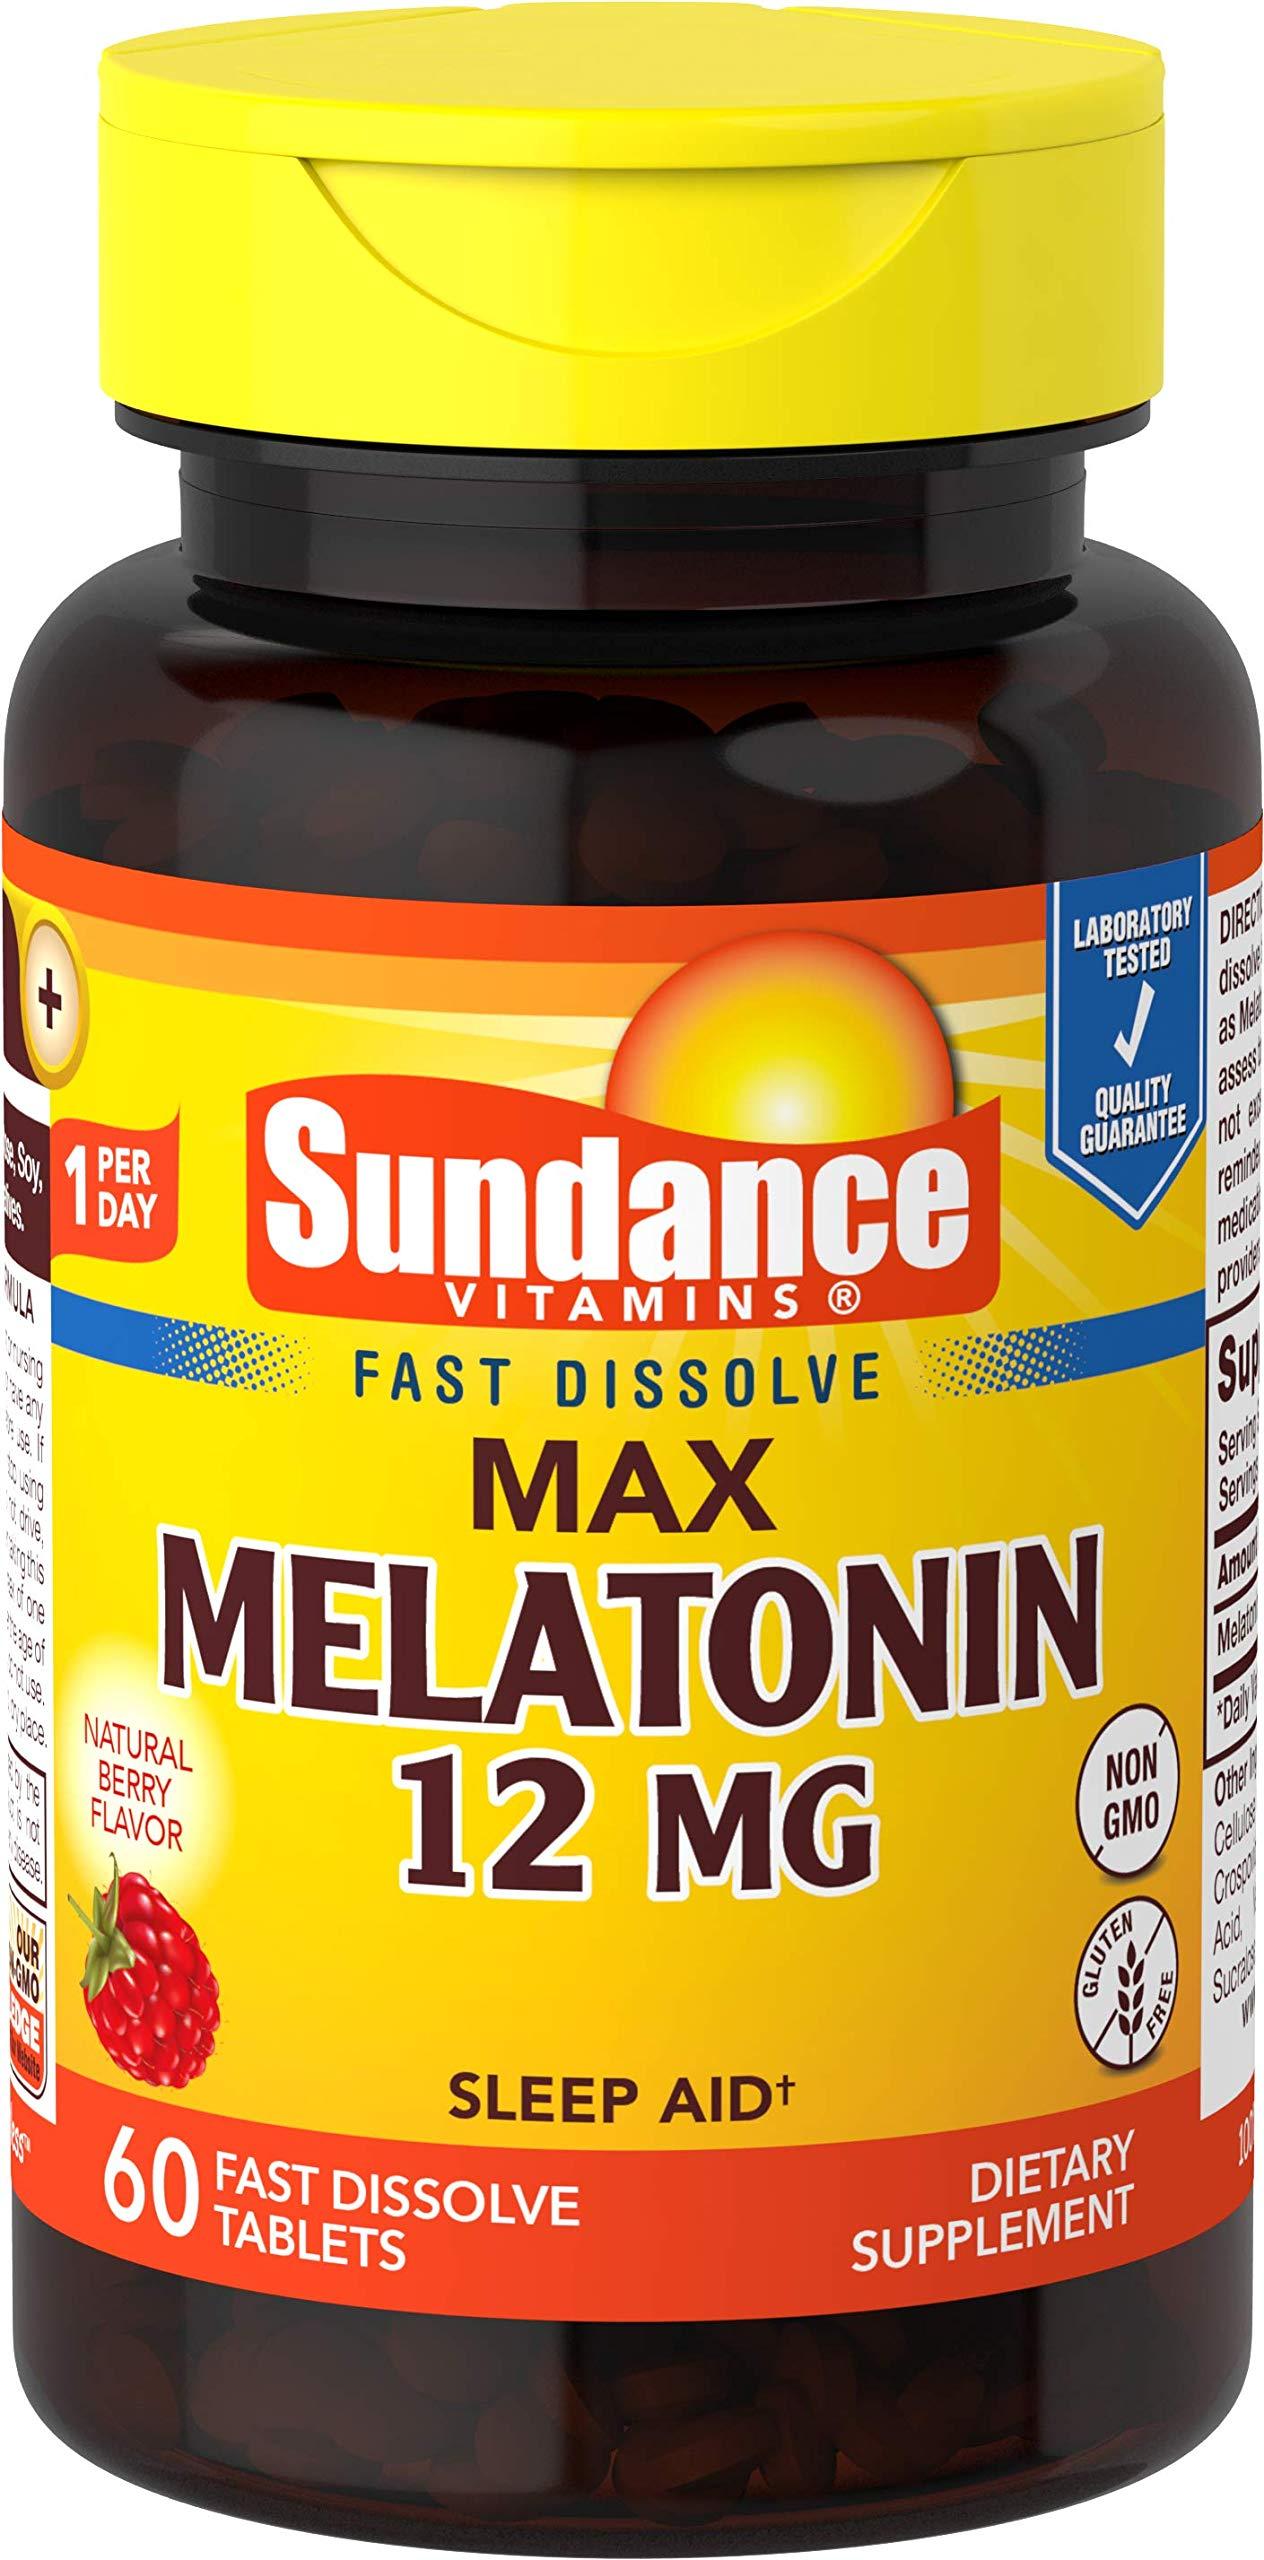 Sundance 12 Mg Melatonin Tablets, 60 Count